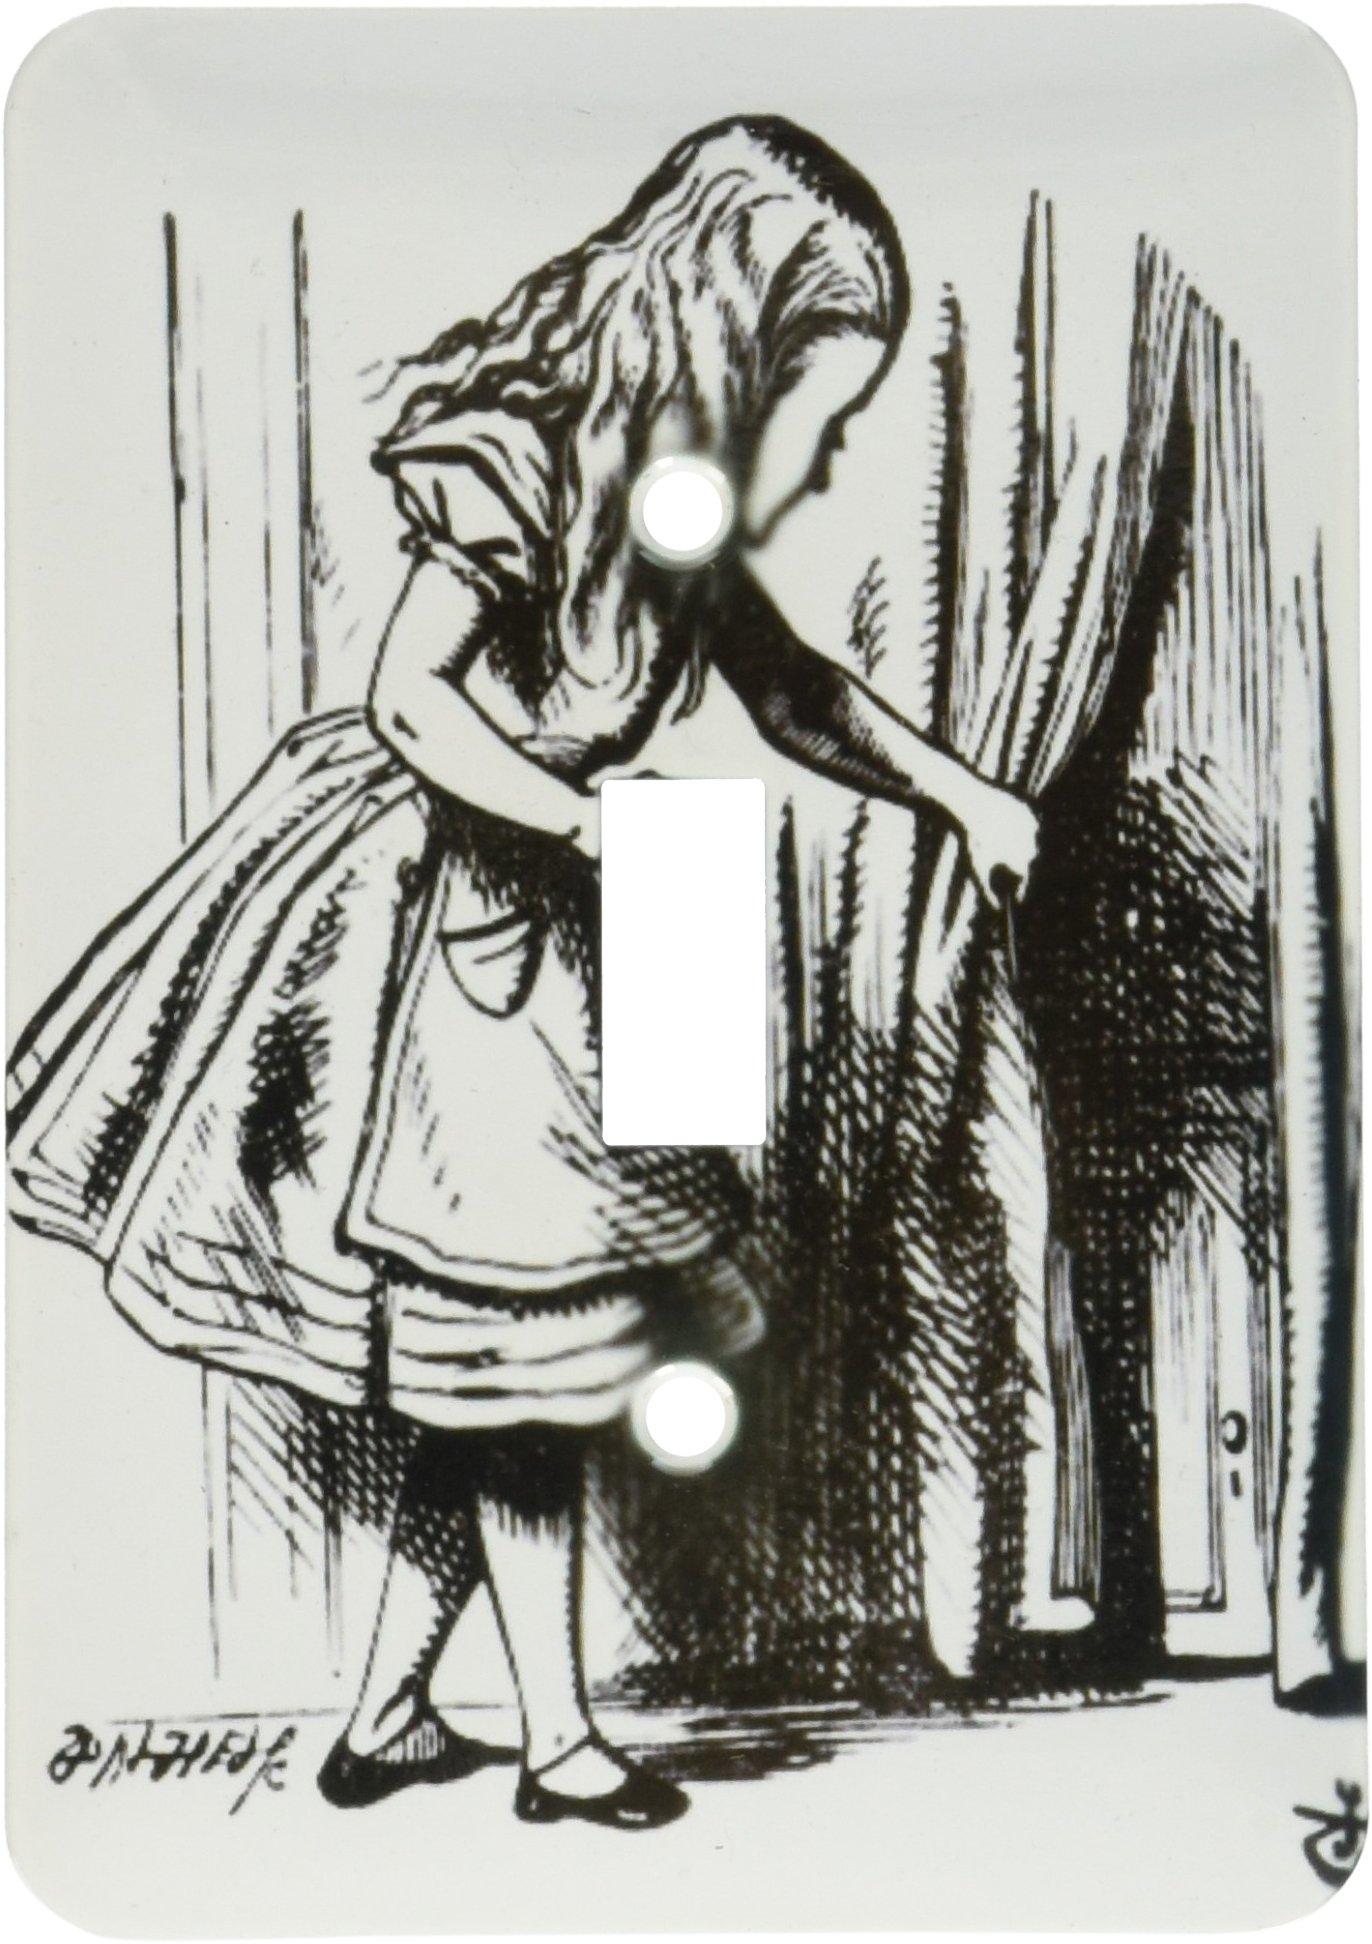 3dRose lsp_193793_1 Alice in Wonderland Key Opening the Door John Tenniel Illustration Single Toggle Switch